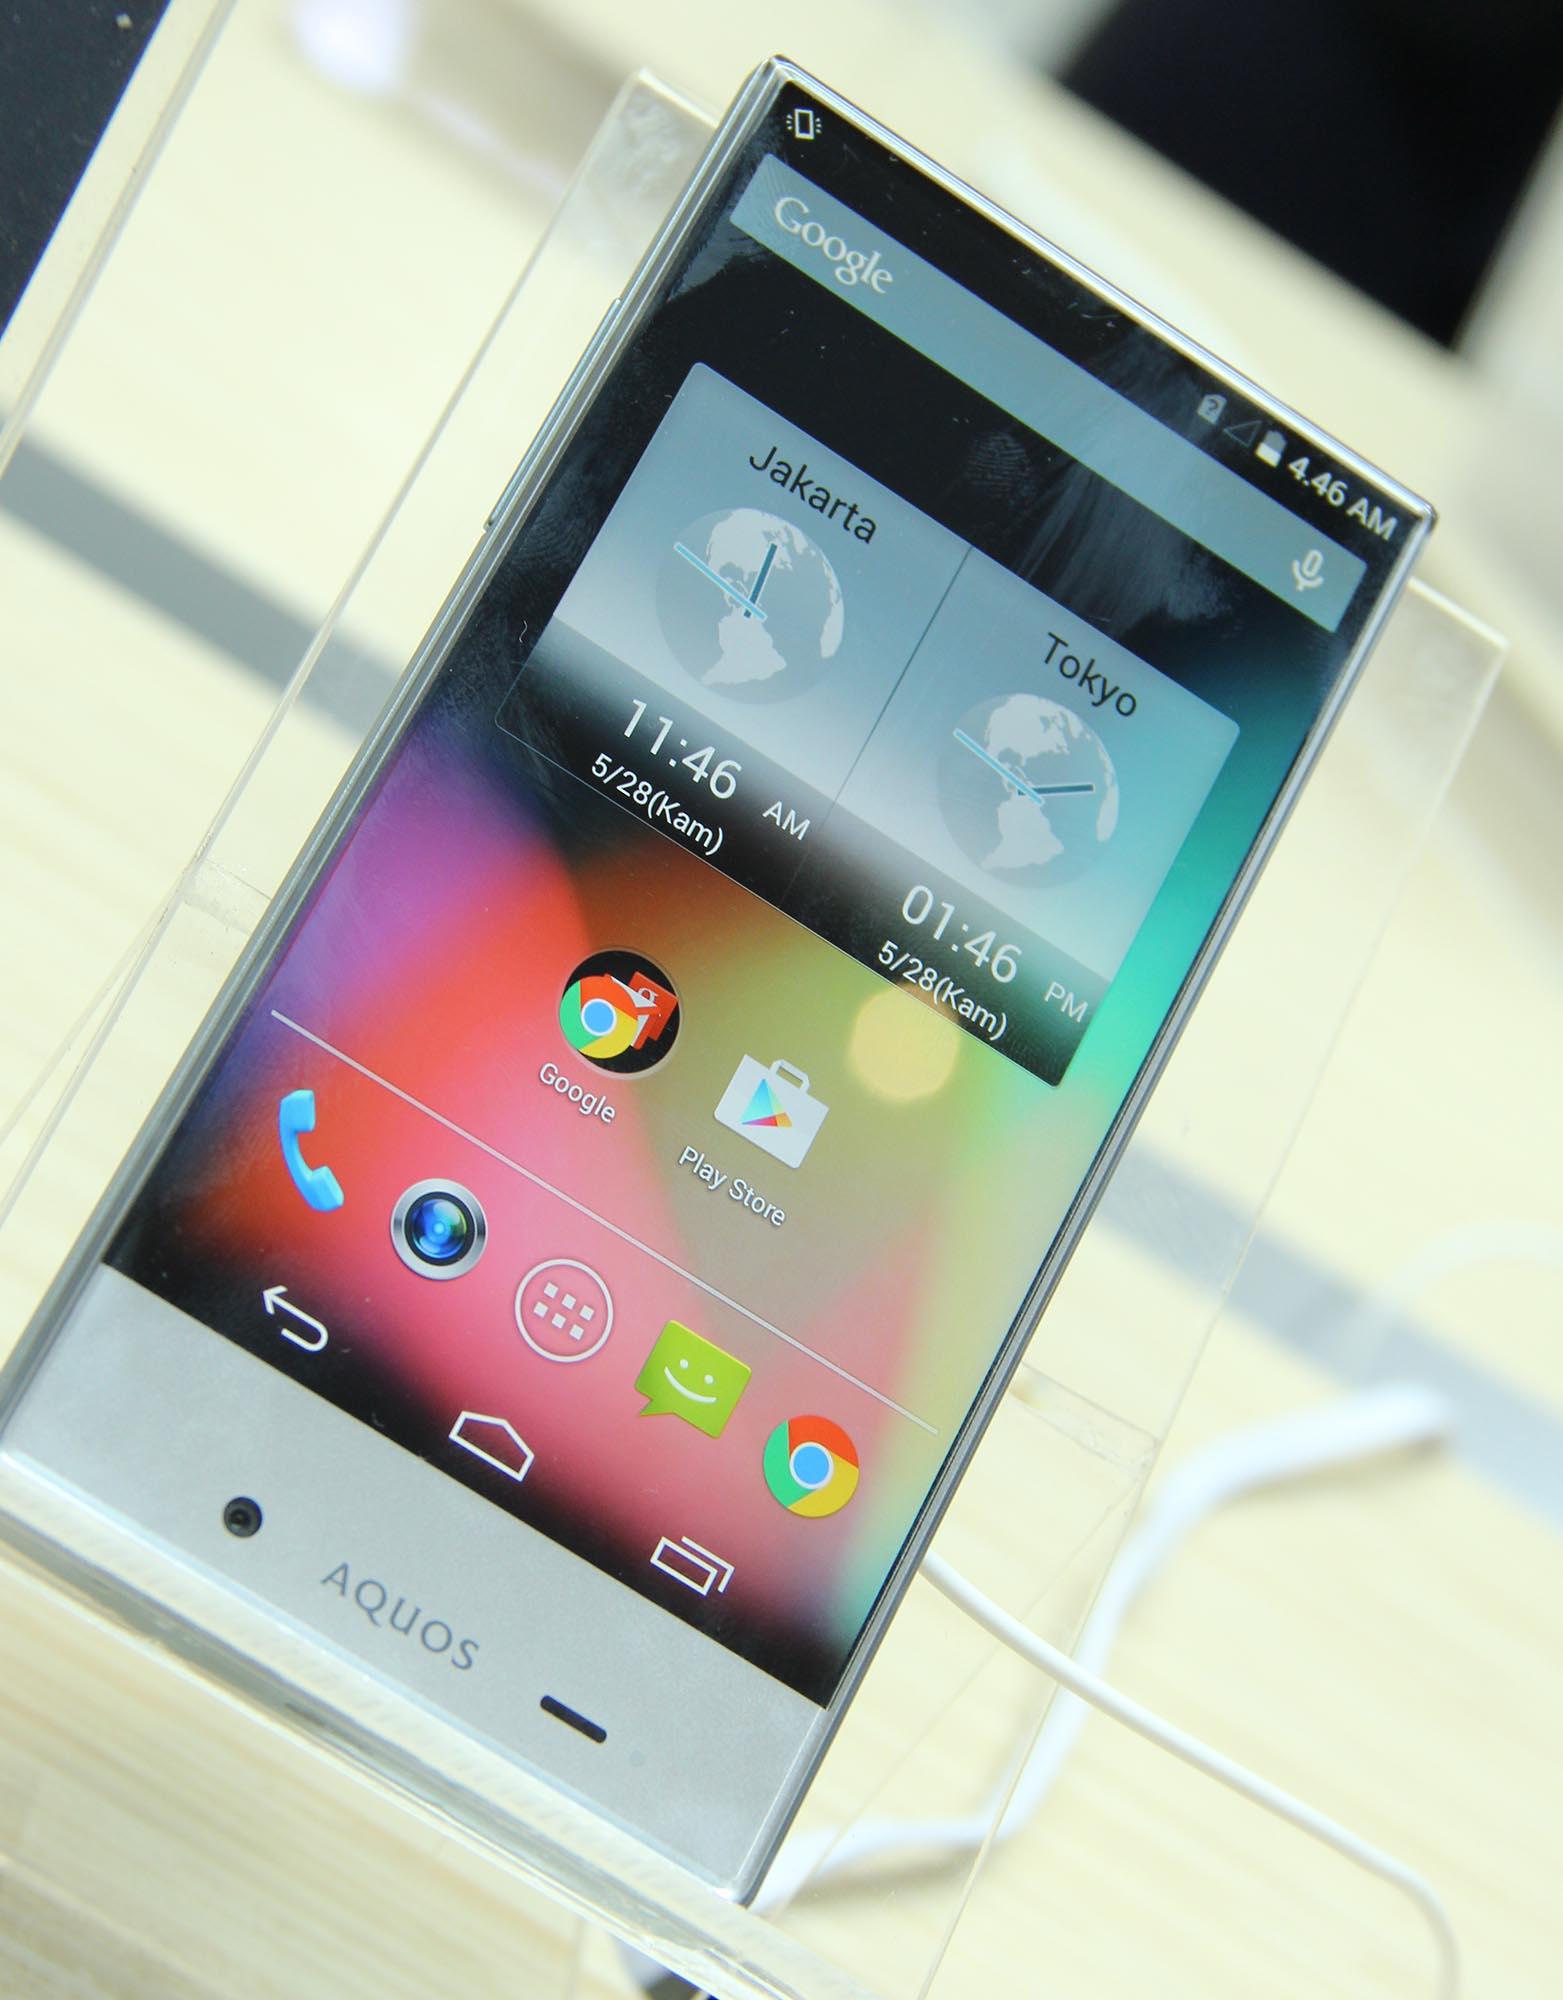 Sharp Aquos 4G